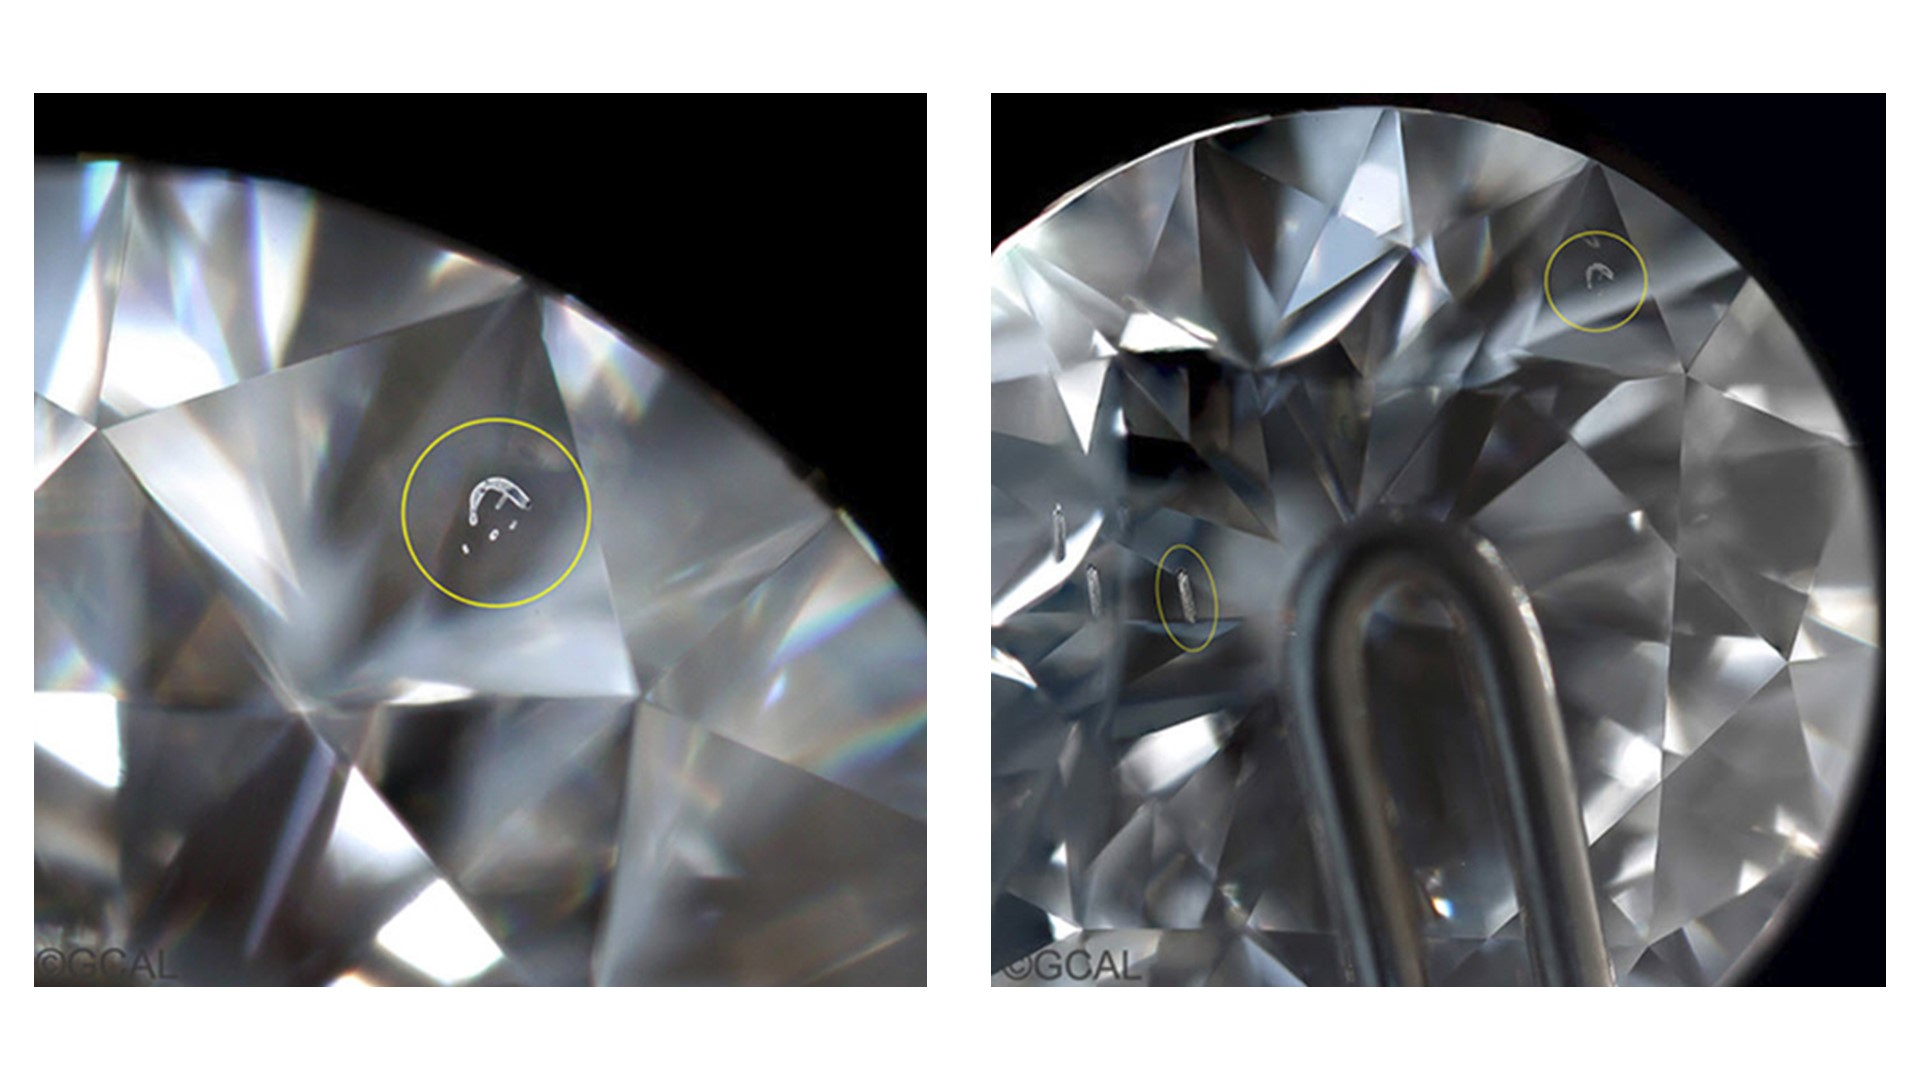 lab grown diamonds - metallic flux inclusions